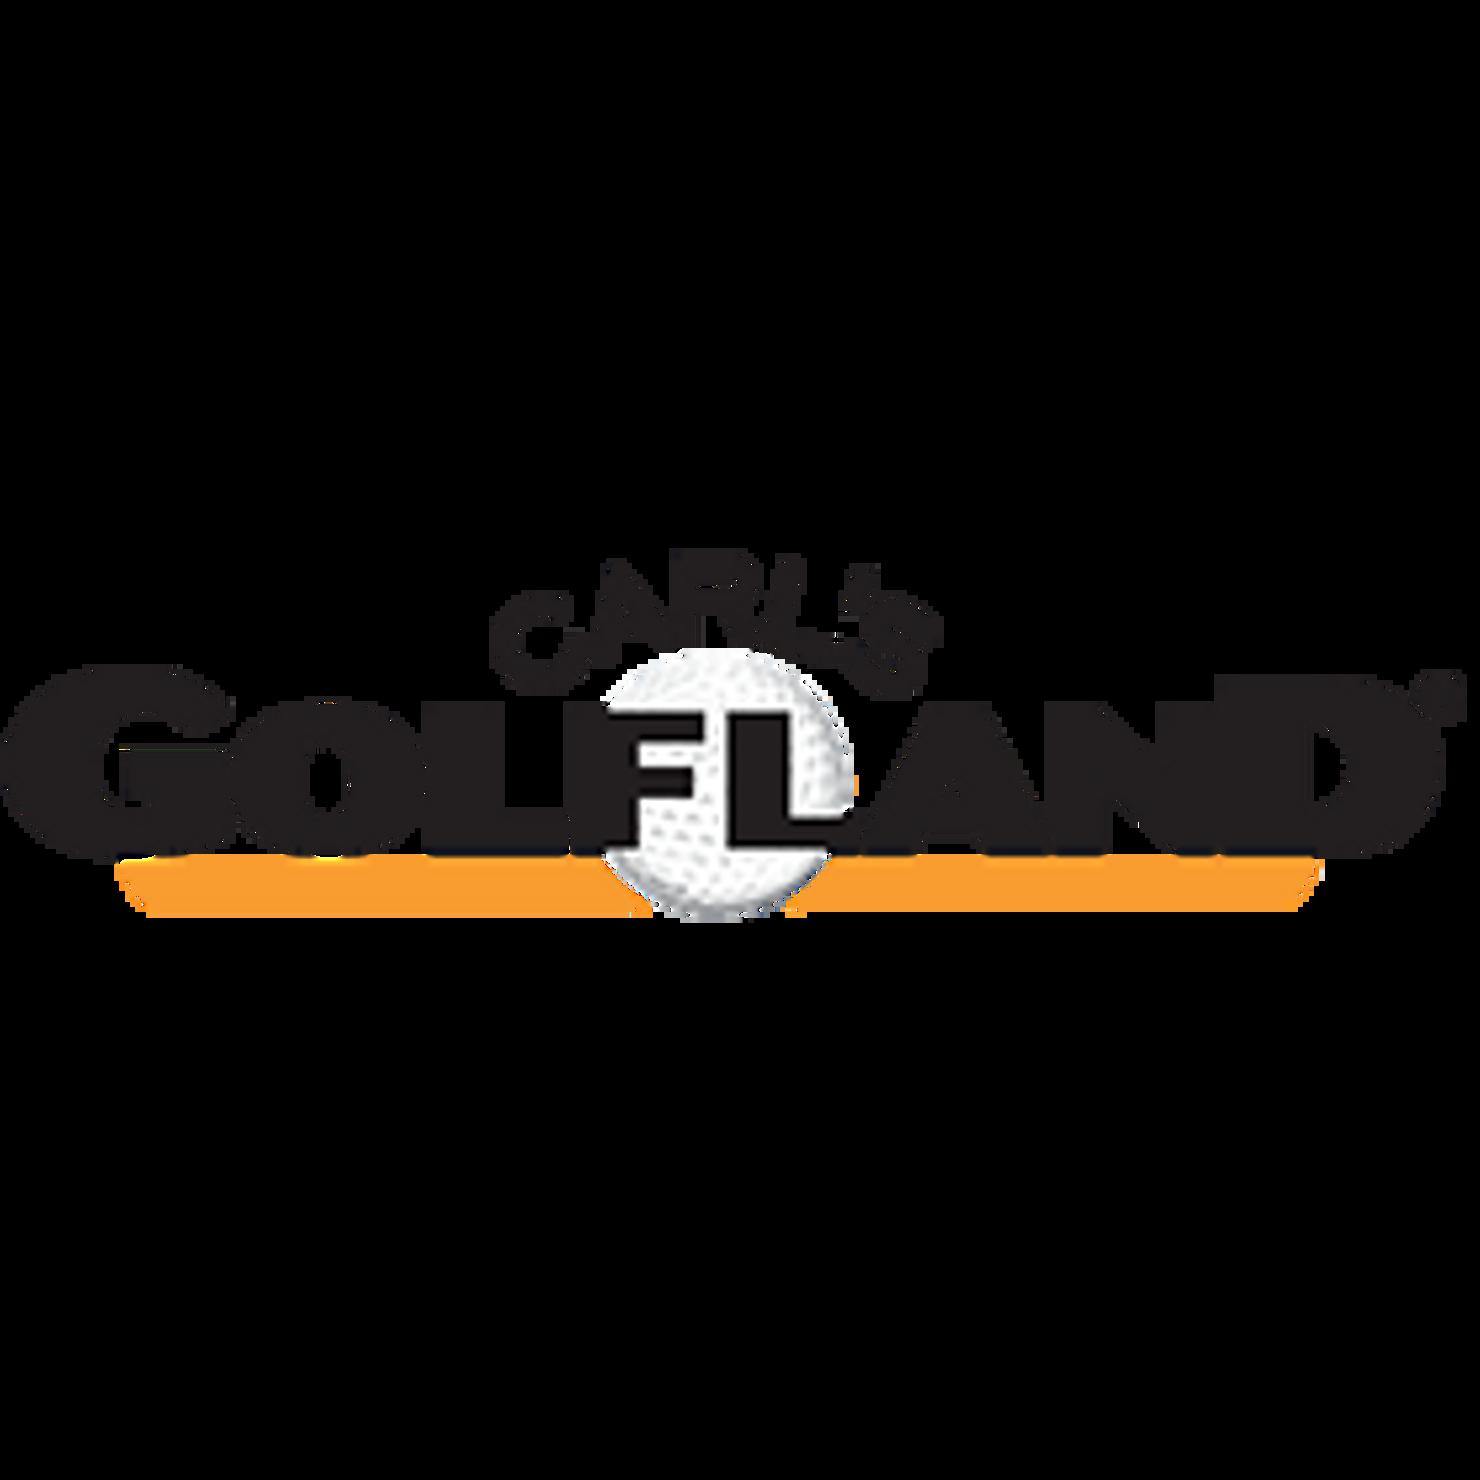 Nike sport lite stand bag carls golfland jpg 1480x1480 Pink nike golf bag 7e3904e6840c0